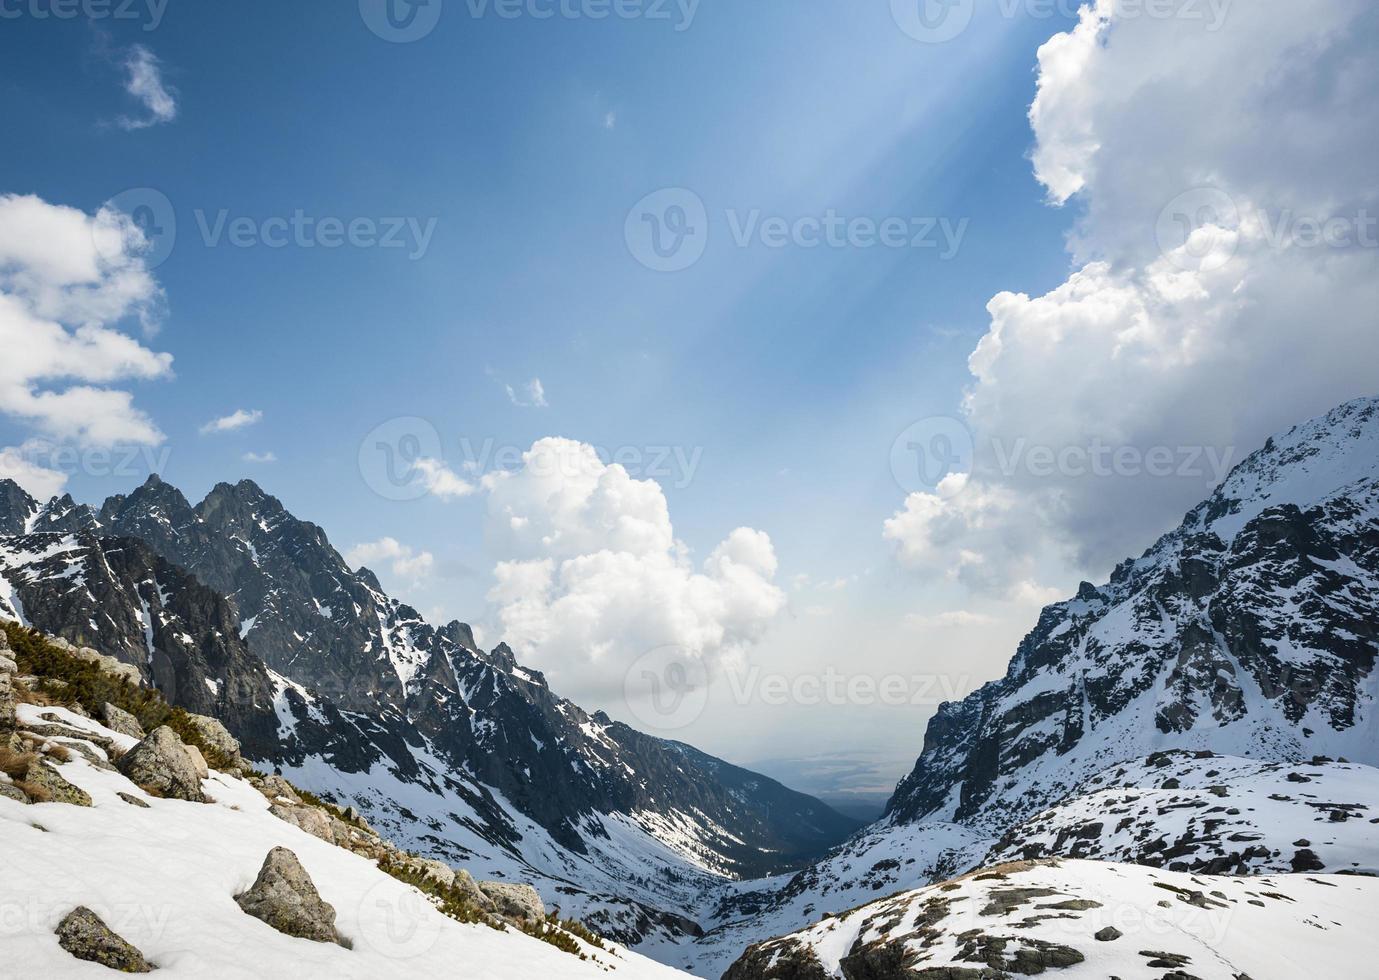 vale da montanha foto